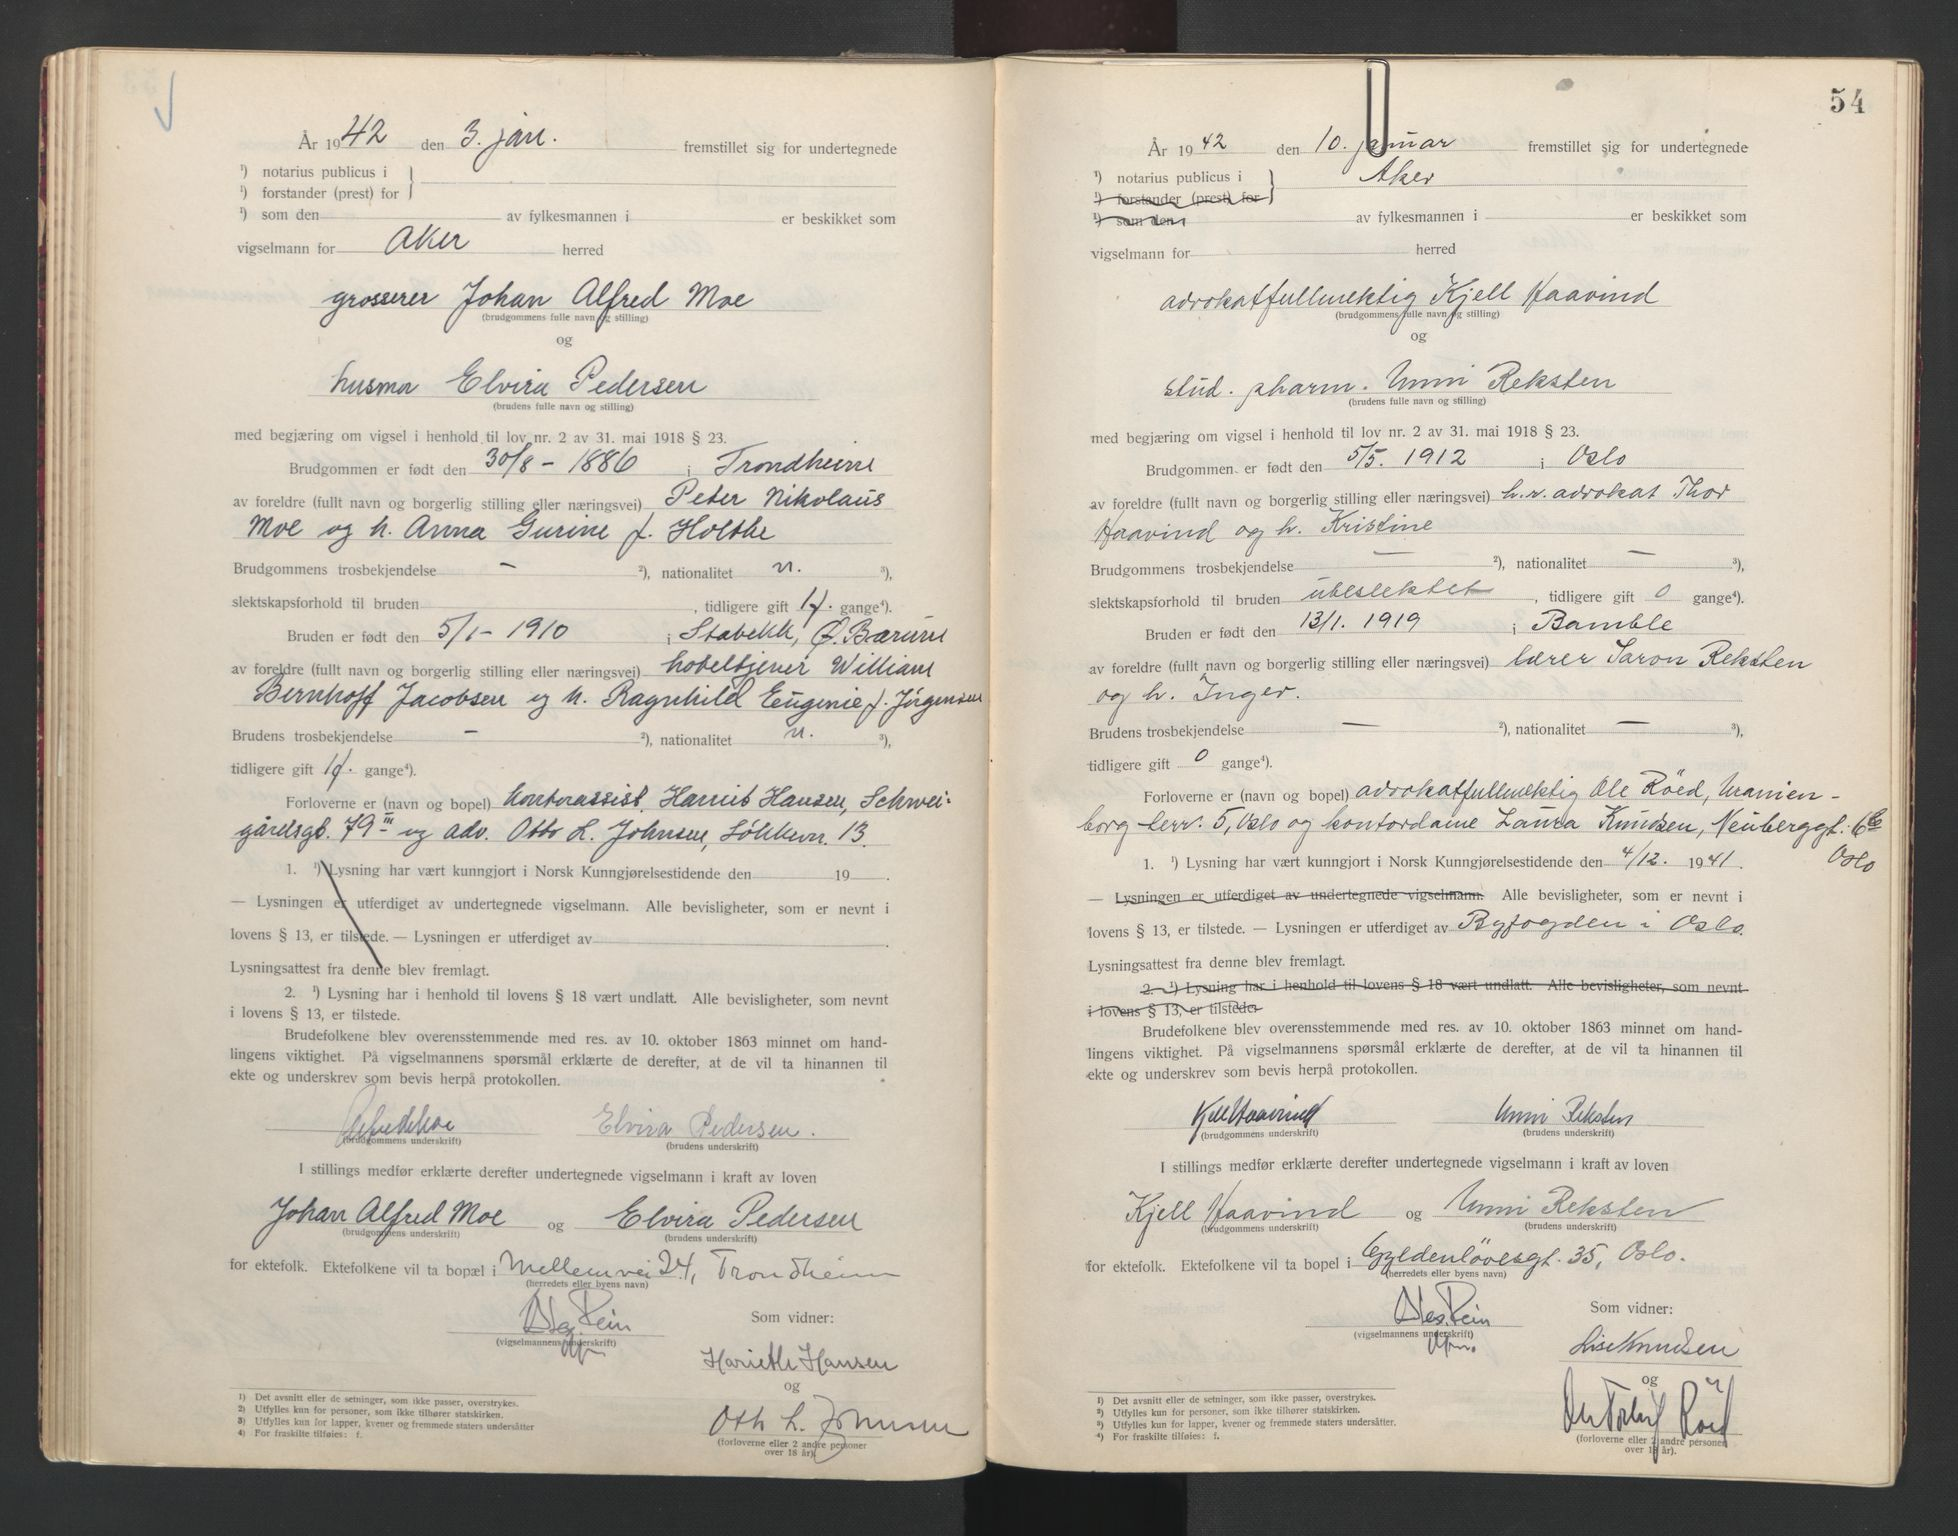 SAO, Aker sorenskriveri, L/Lc/Lcb/L0014: Vigselprotokoll, 1941-1942, s. 54